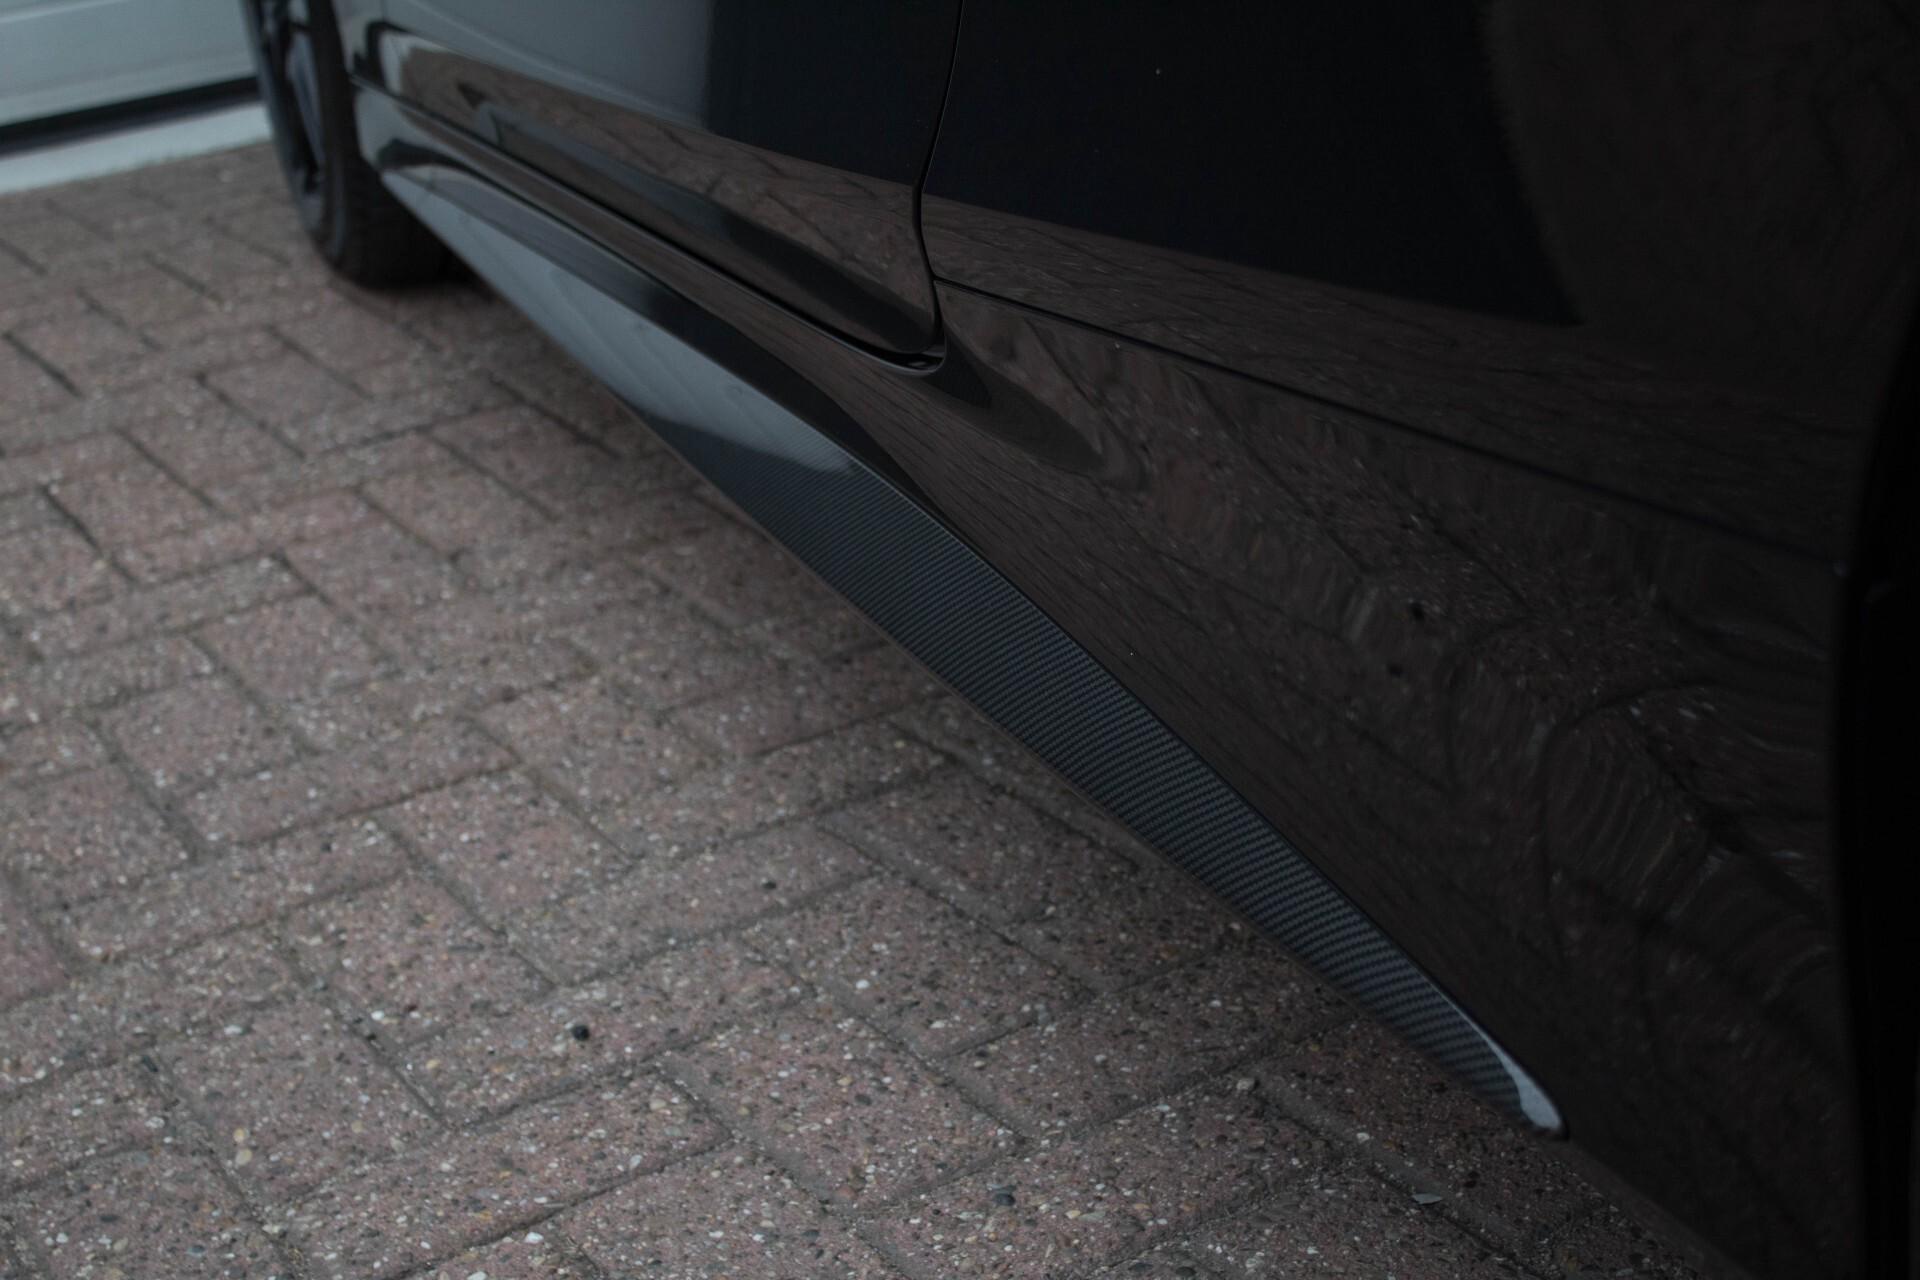 Mercedes-Benz S-Klasse Cabrio 63 AMG 4-M Ceramic/Designo/Carbon/Burmester High End Aut Foto 61